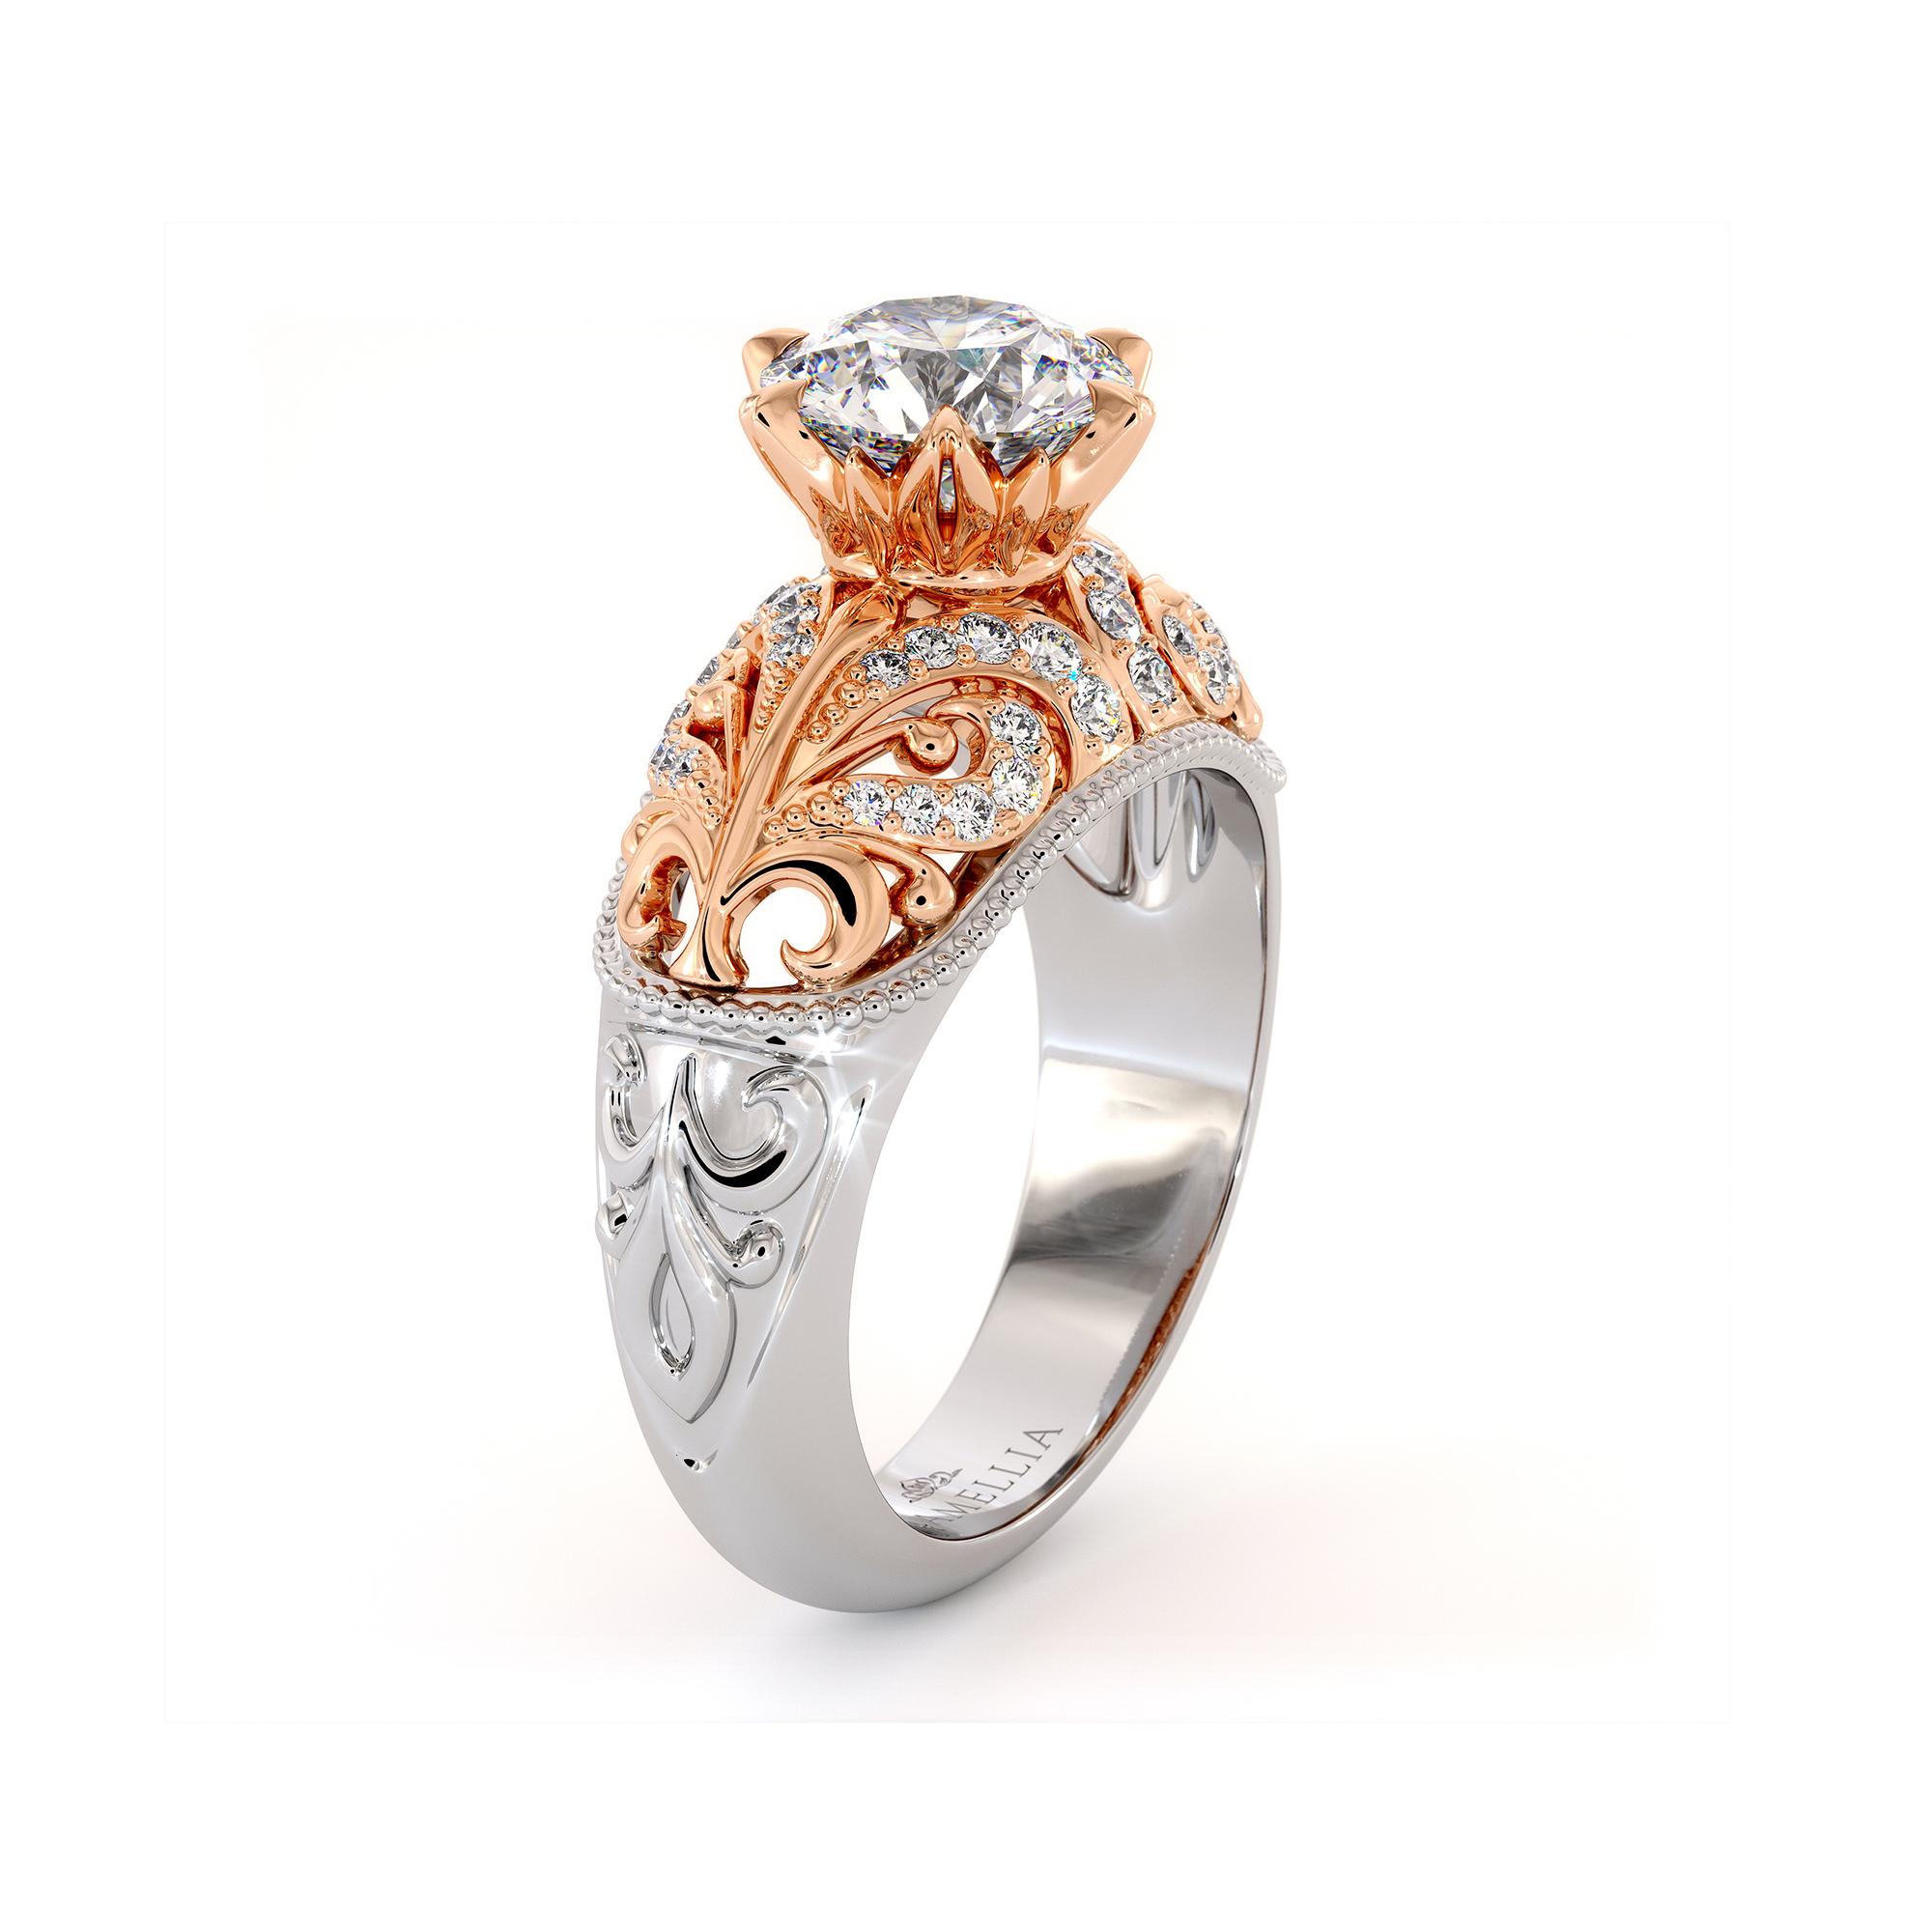 Rapids Diamonds Engagement Ring Sea Waves Ring 1.55 Ct. Round Moissanite Ring Regal 2 Tone Gold Engagement Ring